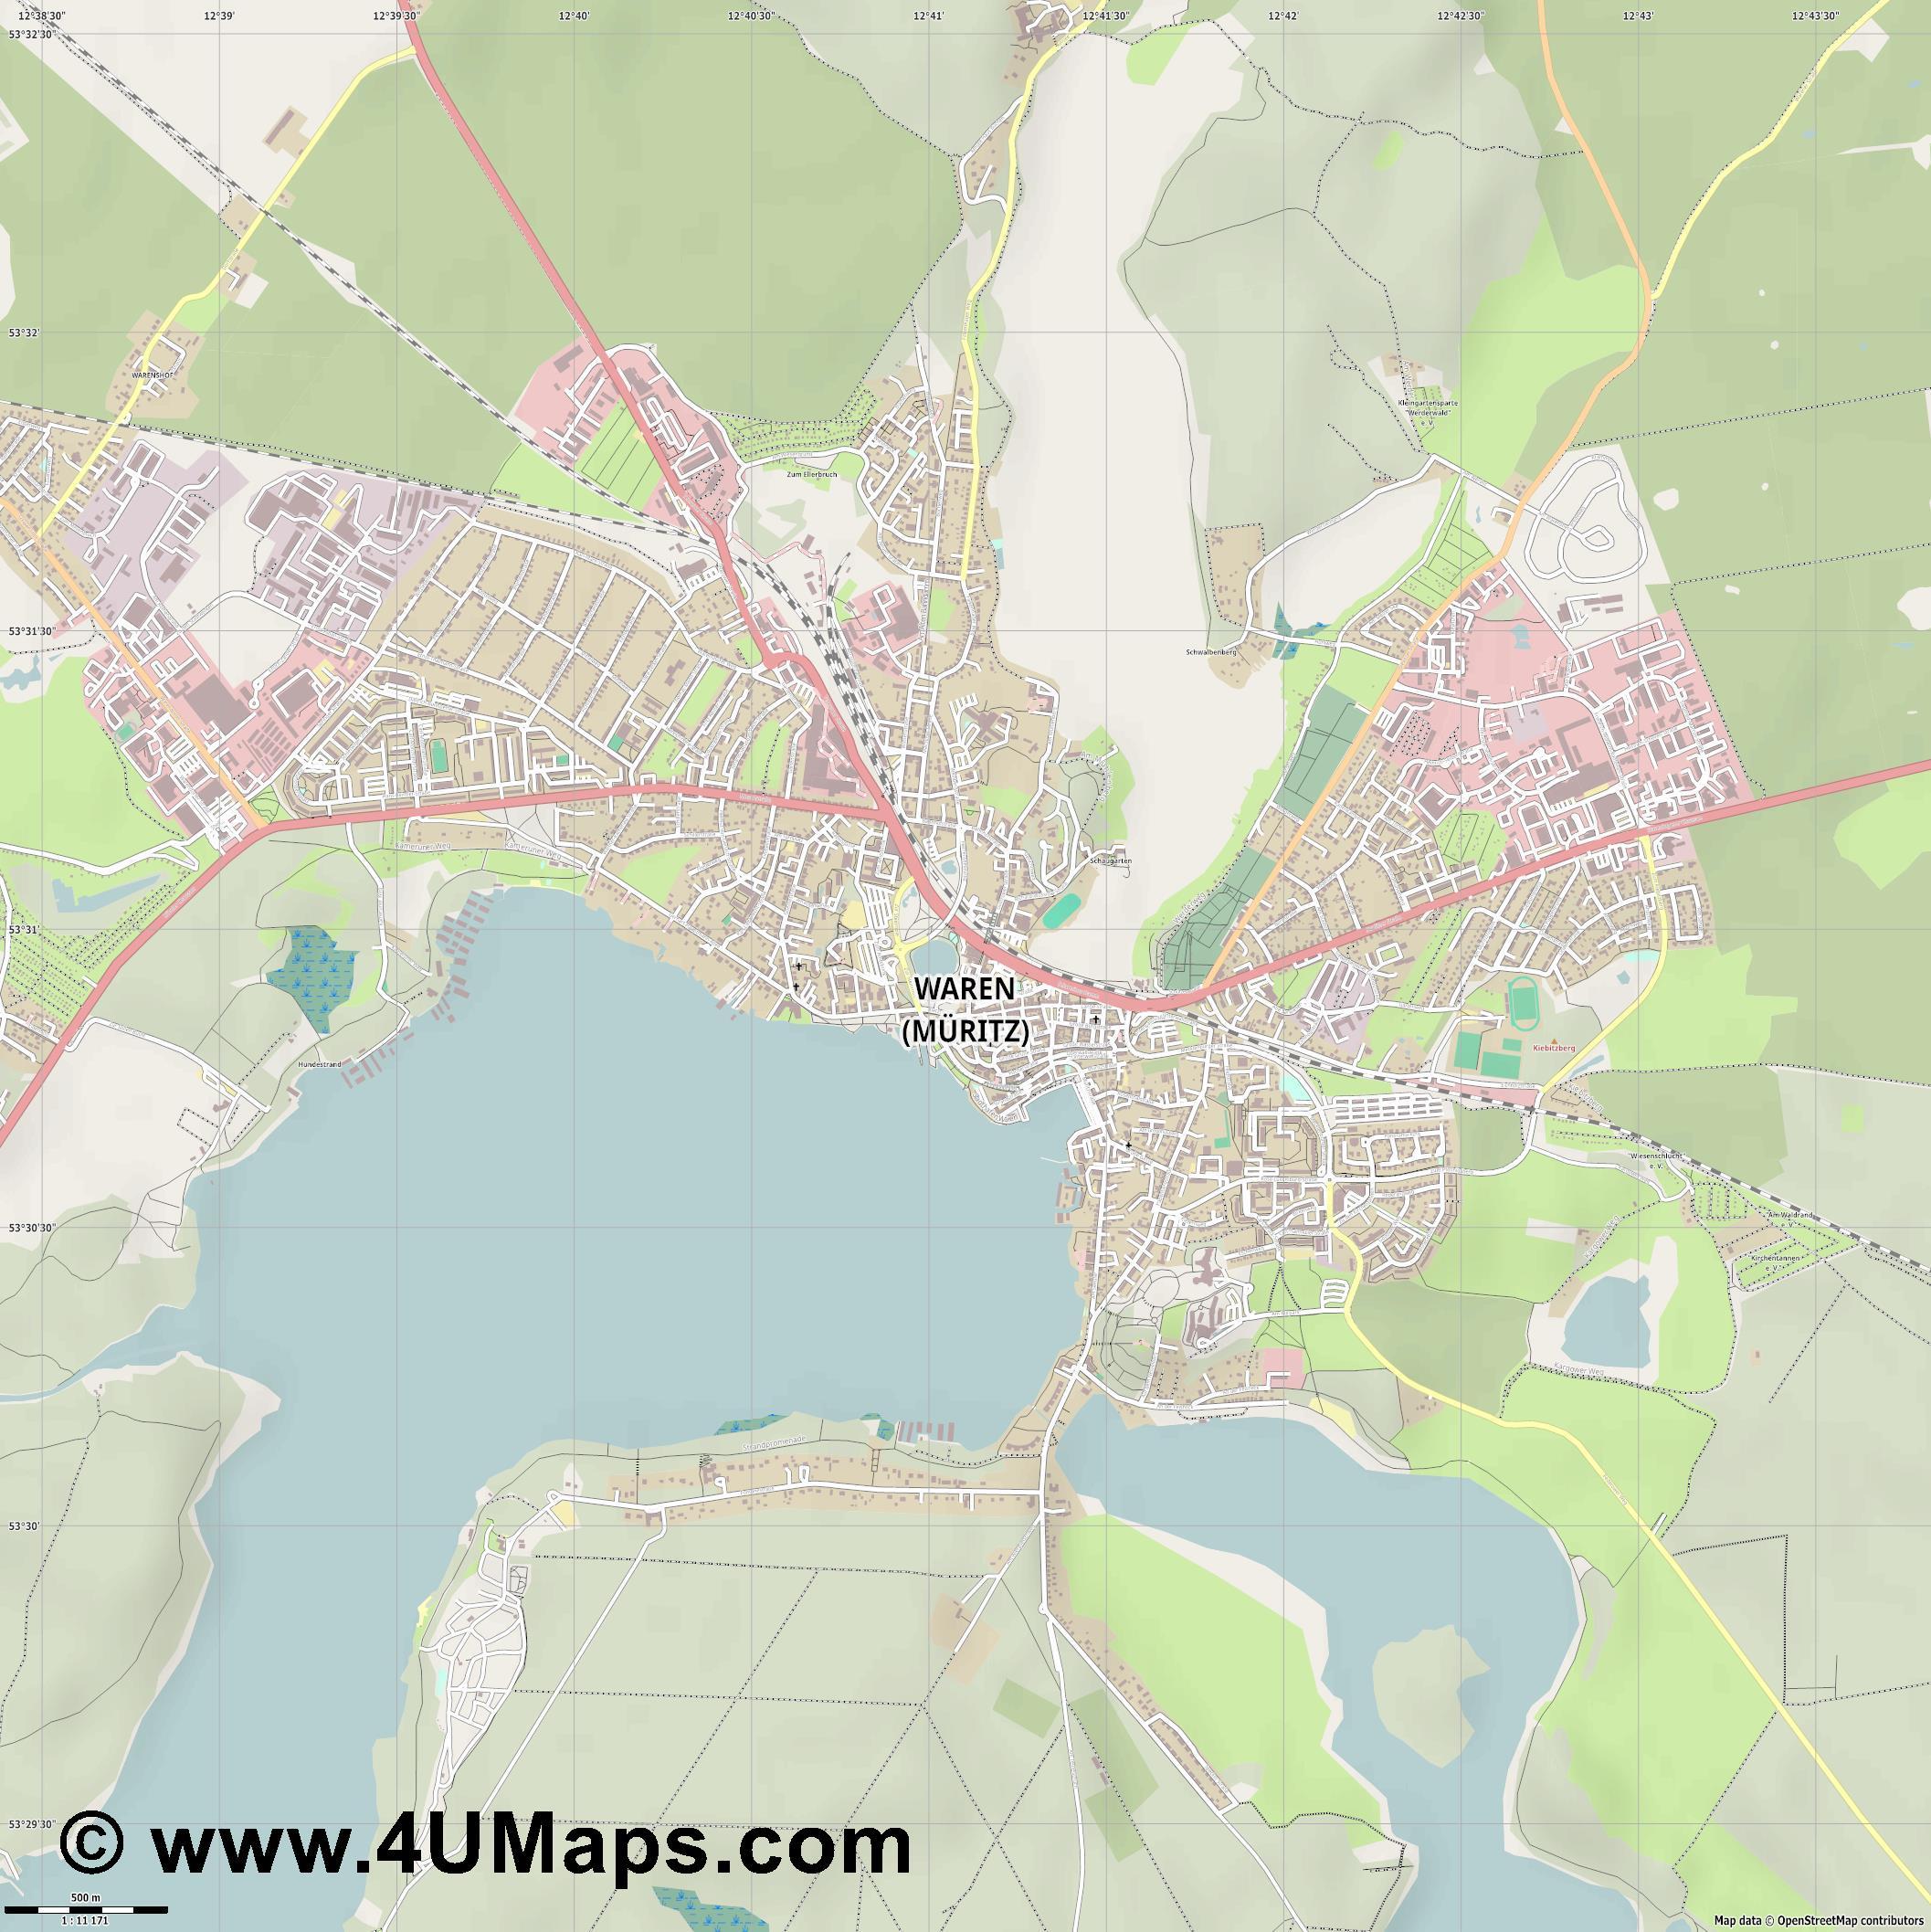 Mecklenburgische Seenplatte Karte Pdf.Pdf Svg Skalierbarer Vektor Stadtplan Vektorkarte Waren Muritz